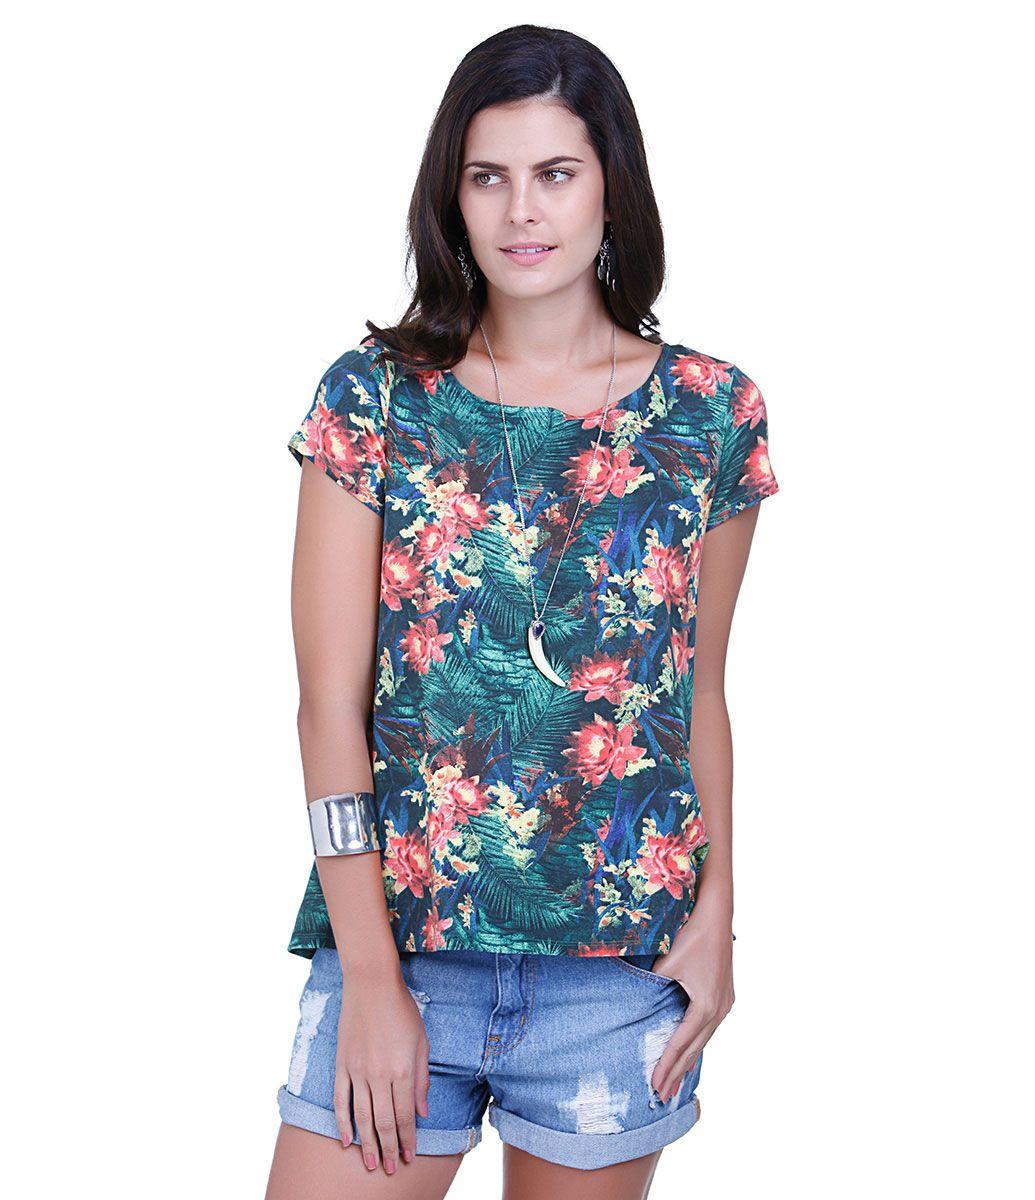 e3de6a84e0 Blusa feminina Modelo mullet Manga curta Decote redondo Estampa floral Gota  nas costas Marca  Marfinno